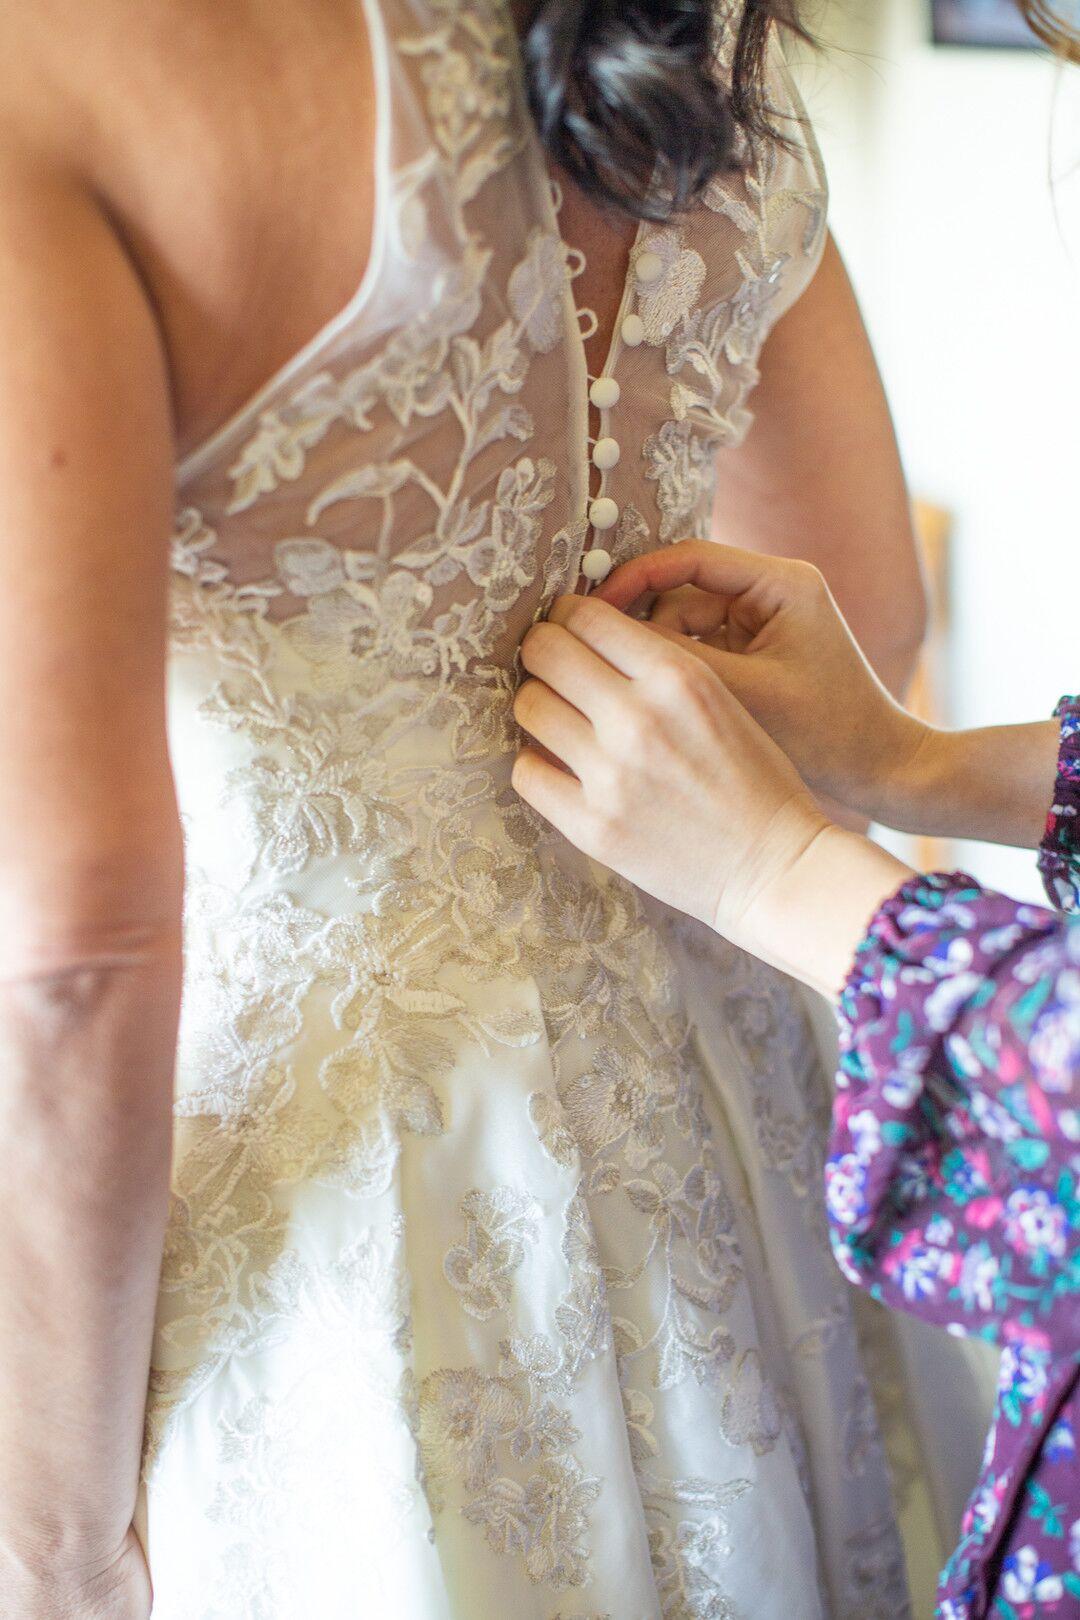 www.santabarbarawedding.com | Venue: The Casitas of Arroyo Grande | Photographer: Renoda Campbell Photography | Second Shooter: John Patrick Images |  Bride Dressing